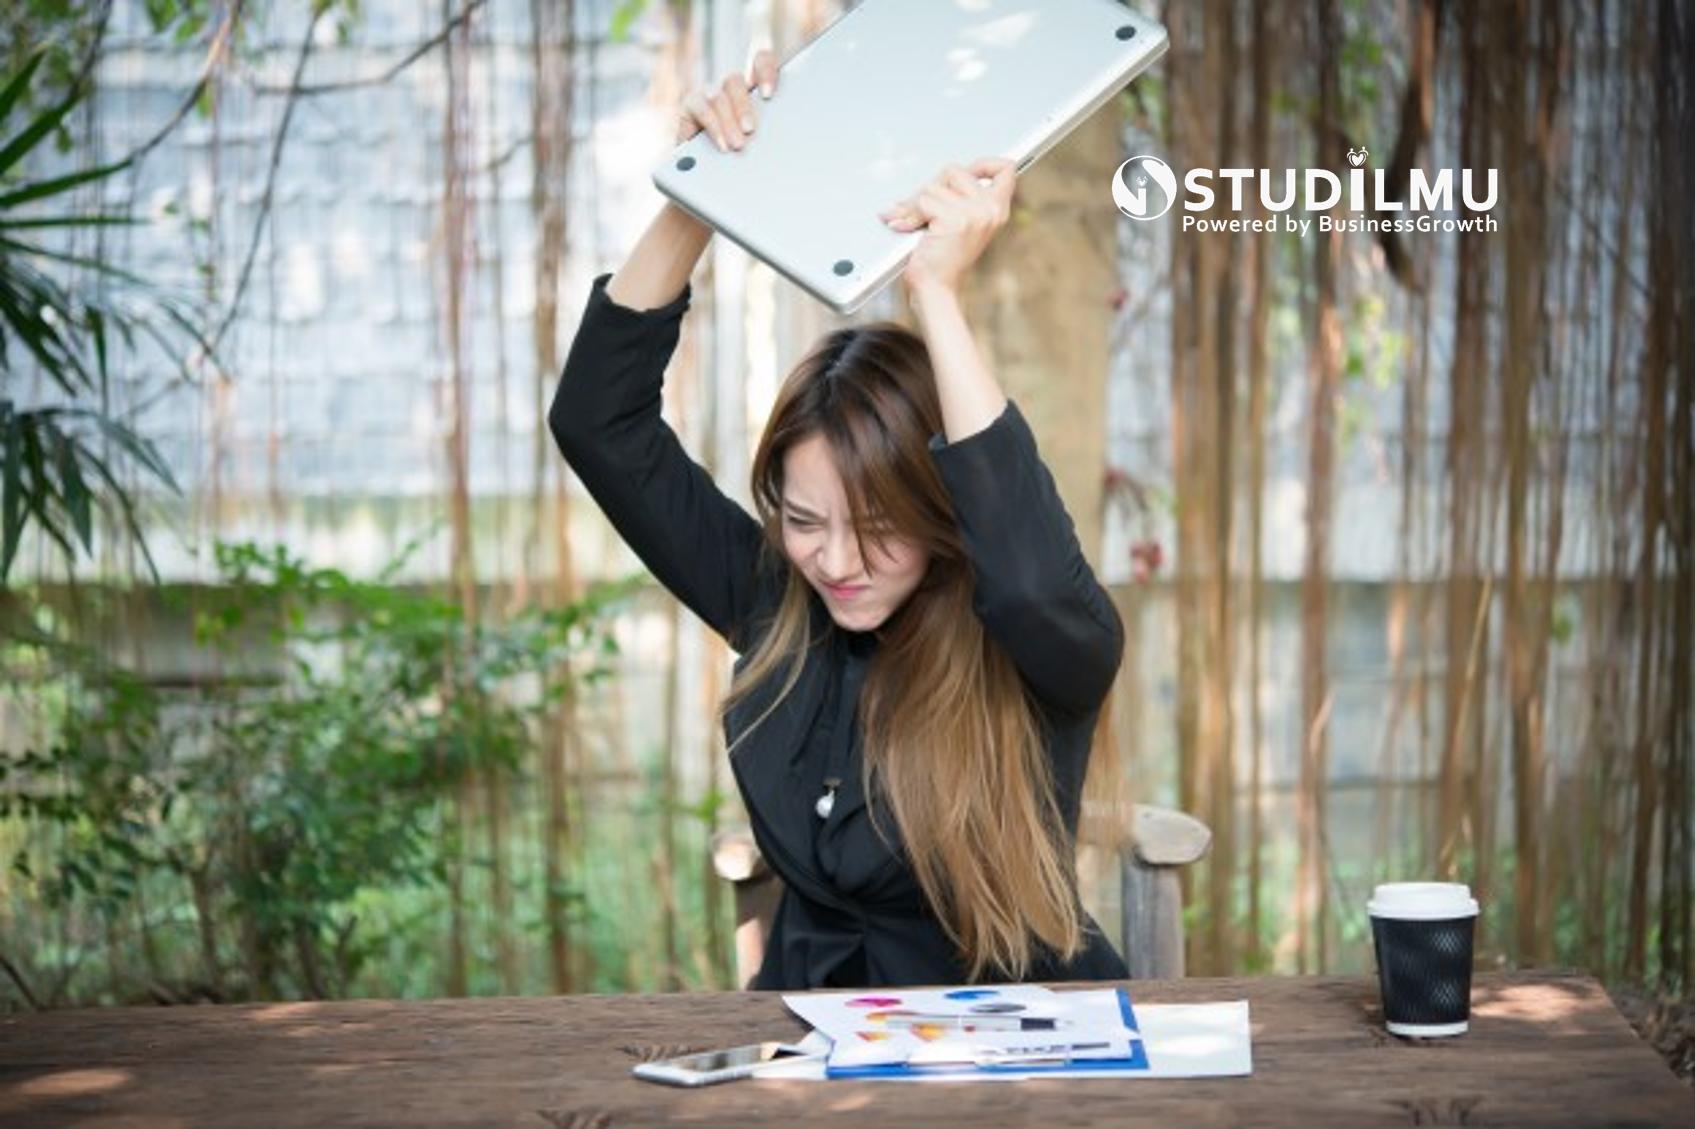 STUDILMU Career Advice - 5 Dampak Positif Kemarahan